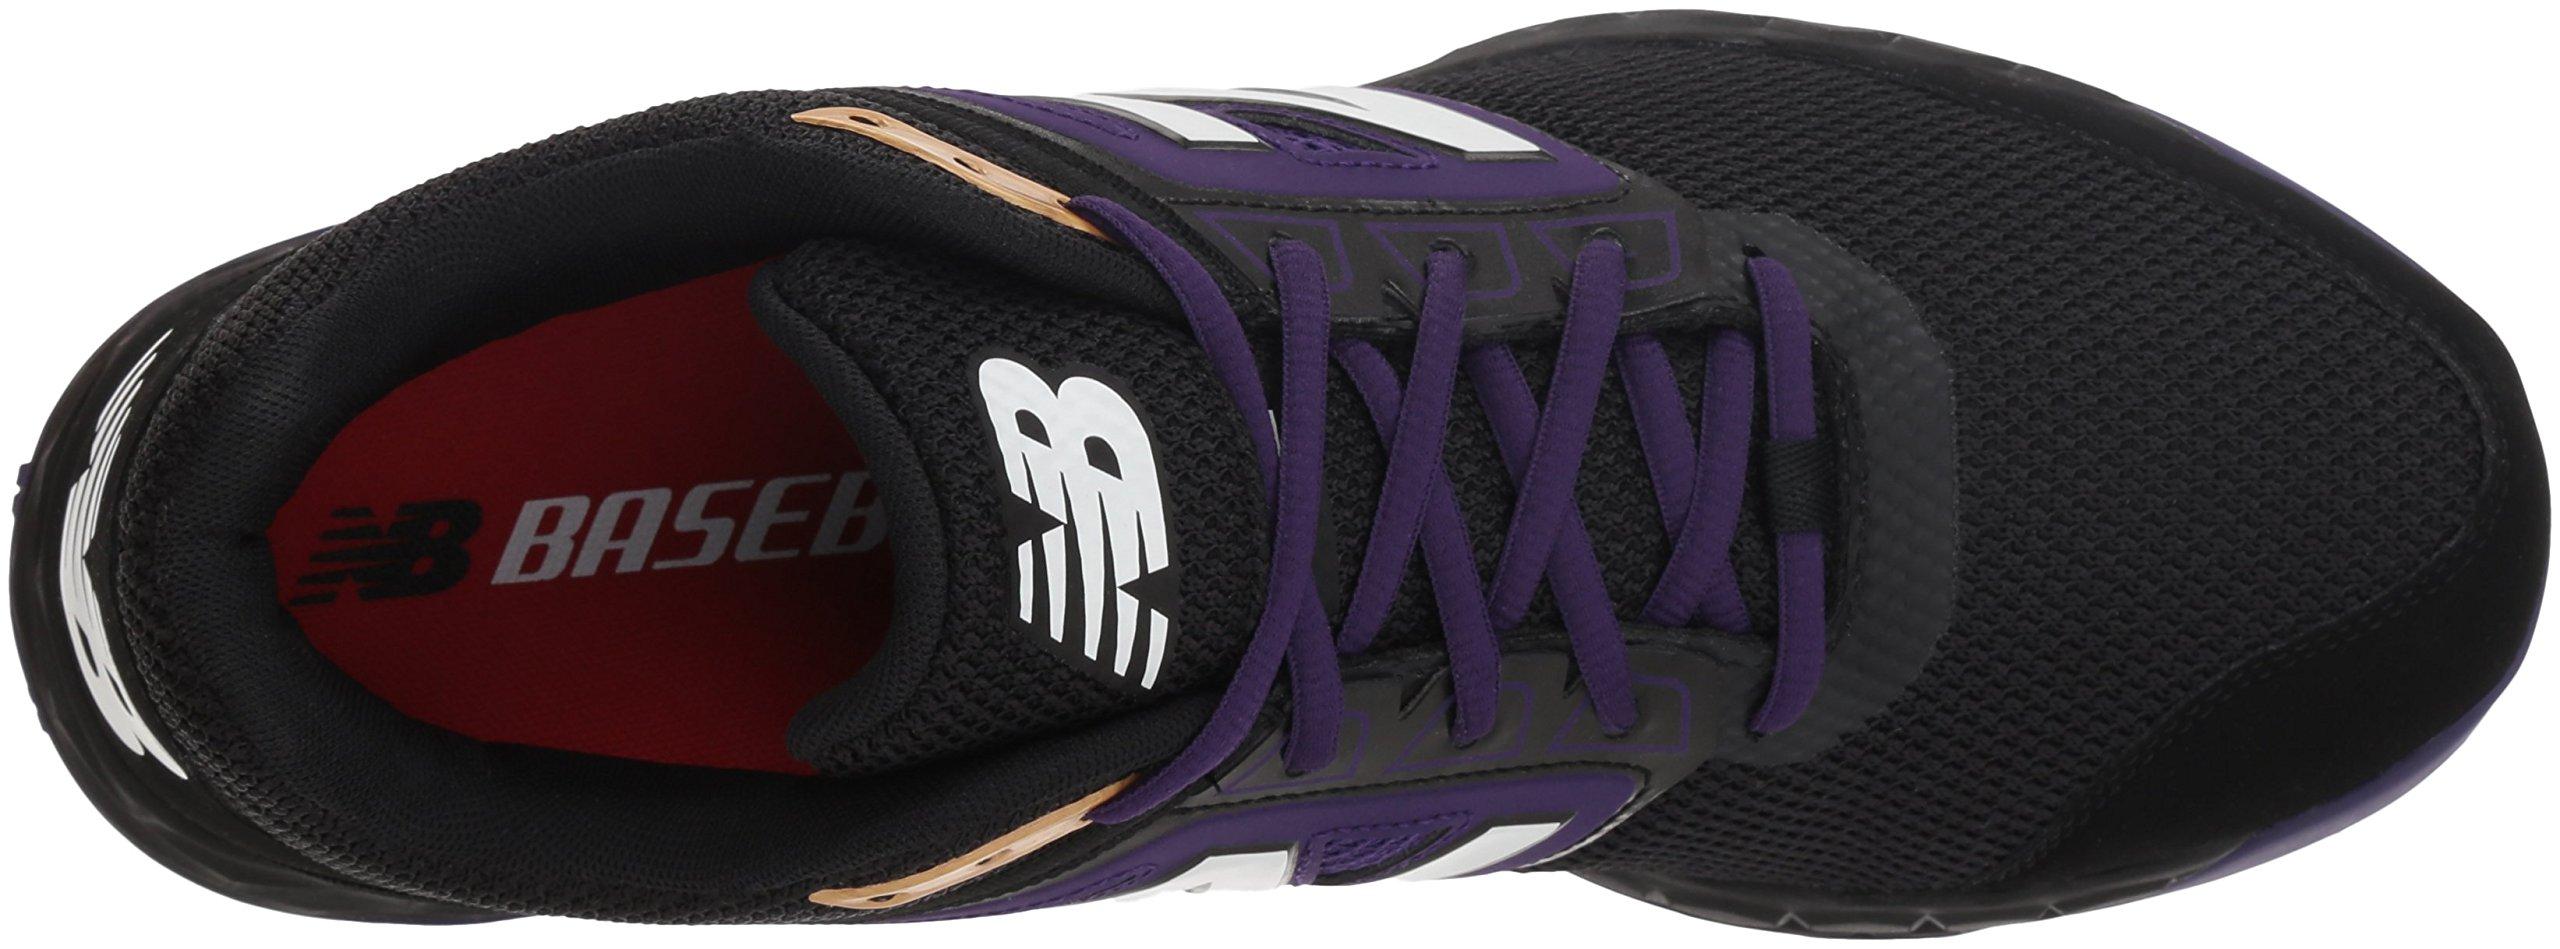 New Balance Men's 3000v4 Turf Baseball Shoe, Black/Purple, 5 D US by New Balance (Image #7)